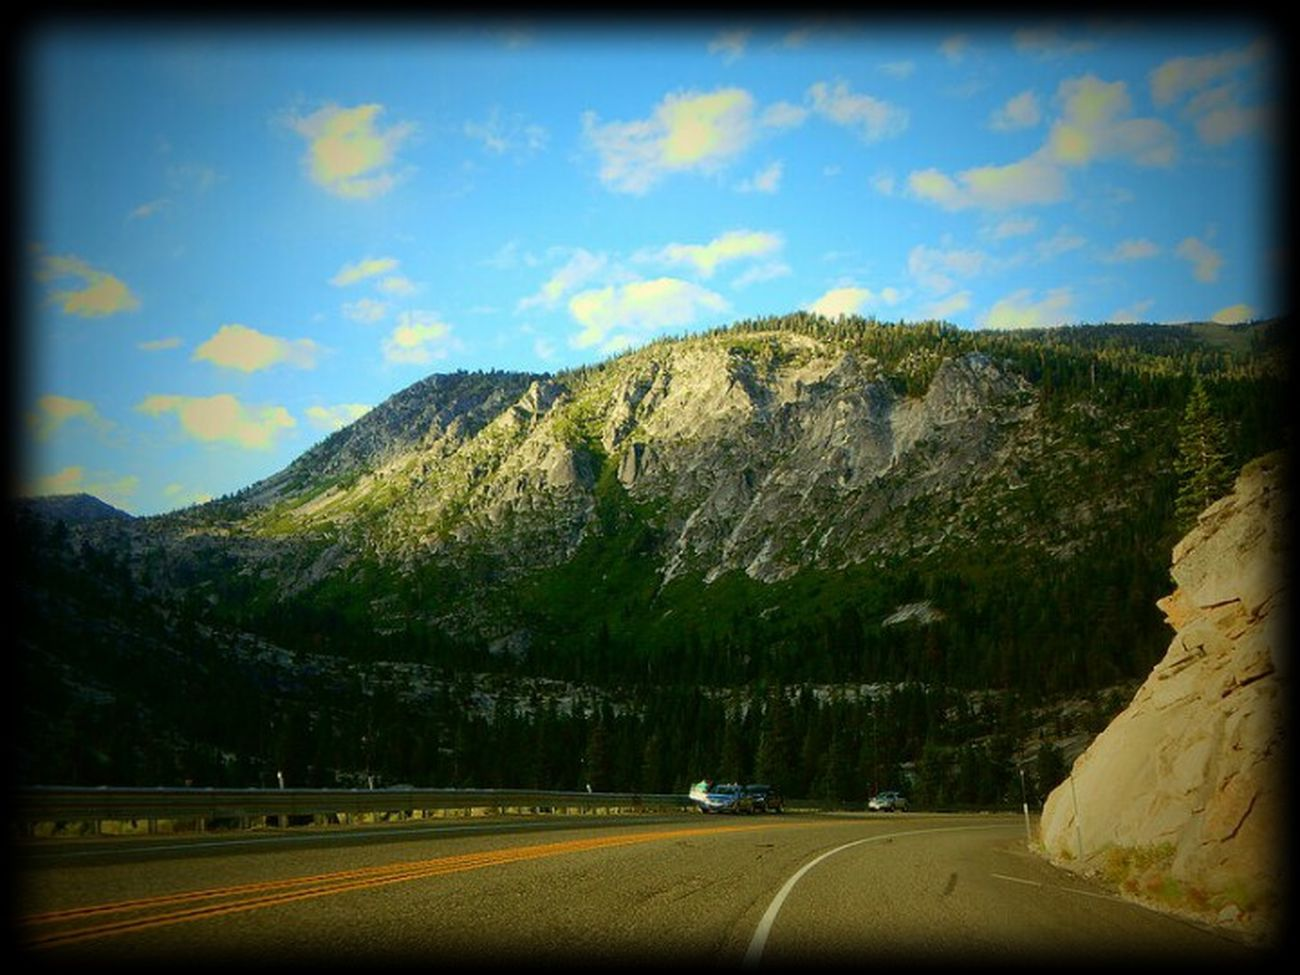 Road Tree Nature Scenics Mountain Sky Day Outdoors Beauty In Nature Nikon L830 California CA